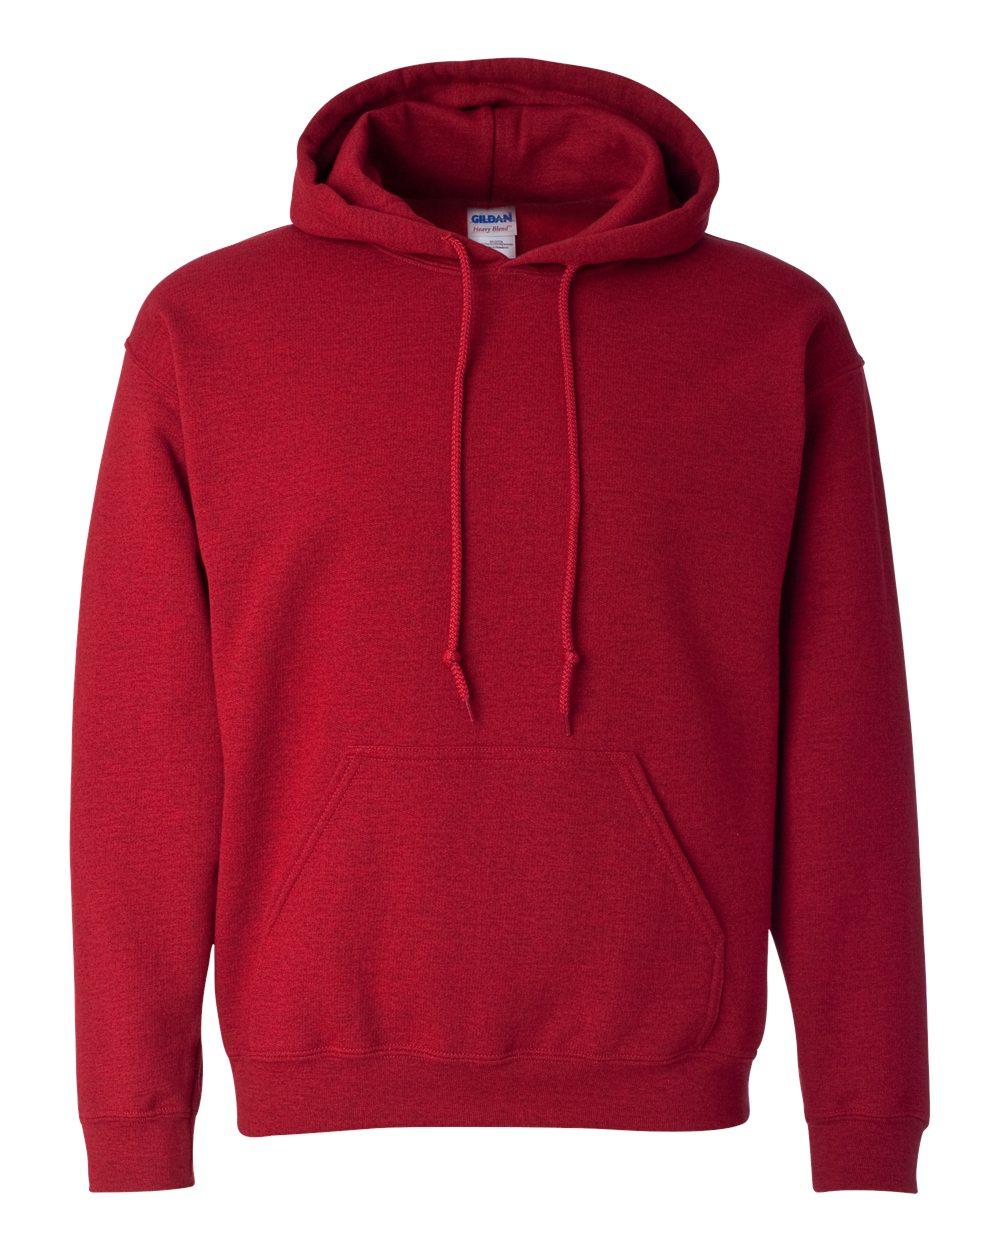 Gildan-Mens-Blank-Hoodie-Heavy-Blend-Hooded-Sweatshirt-18500-up-to-5XL thumbnail 6